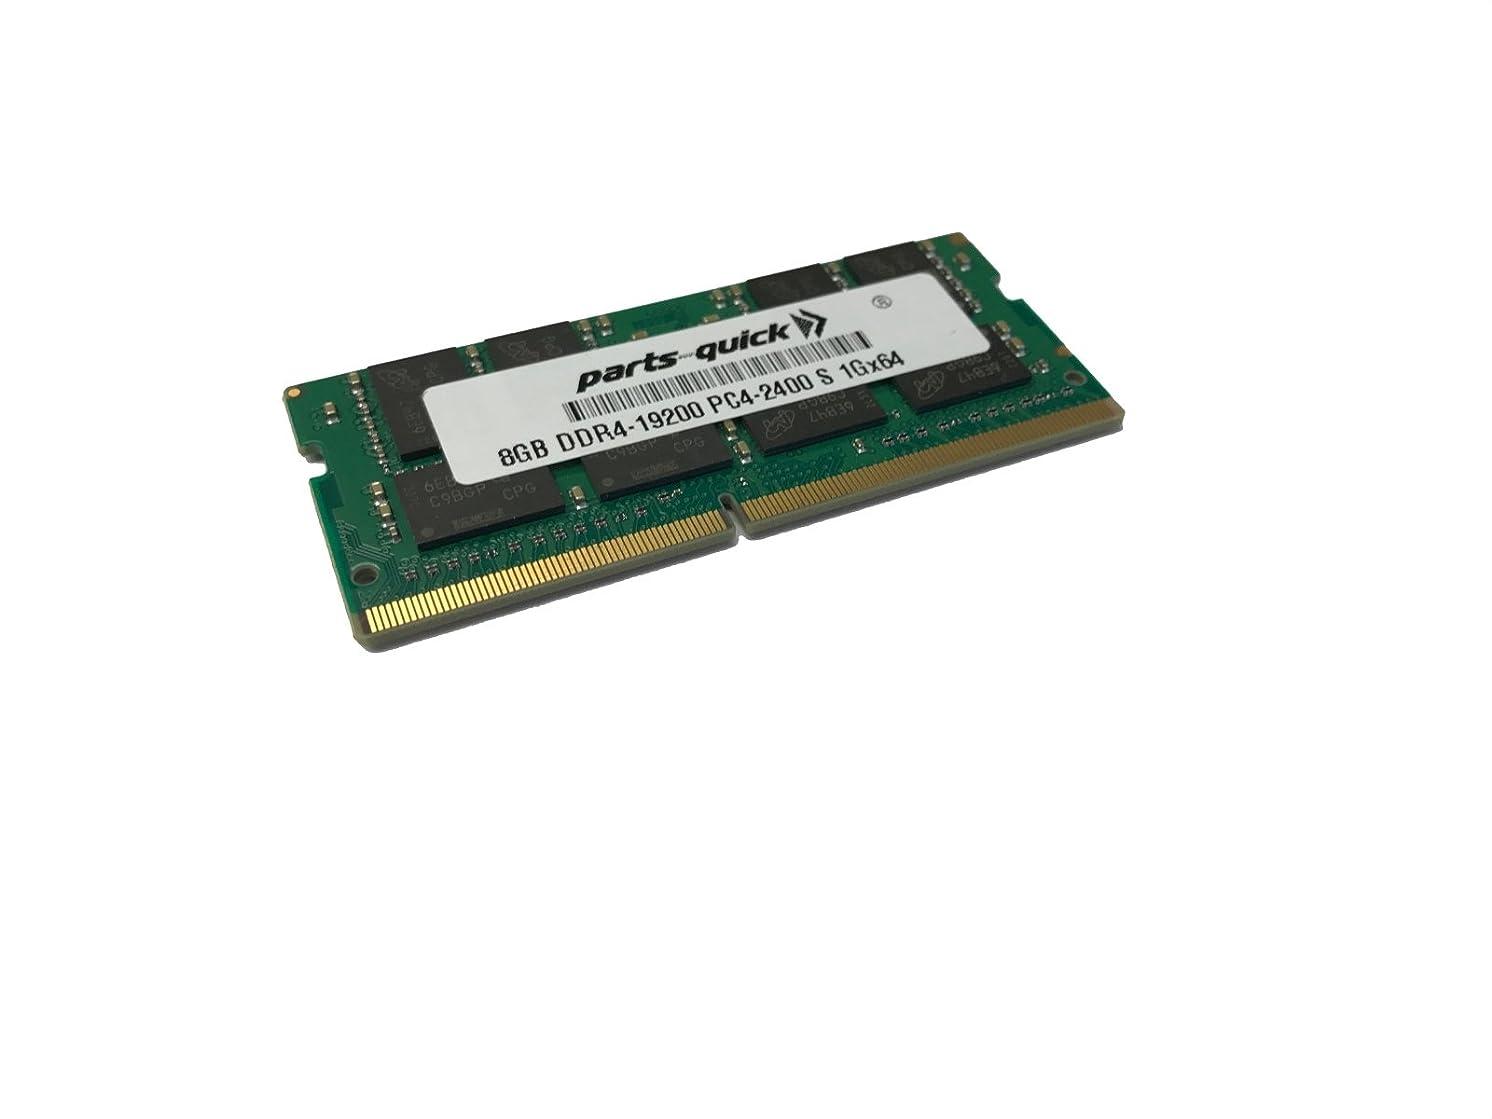 8GB Memory for Lenovo ThinkPad L380 DDR4 2400MHz SoDIMM RAM (PARTS-QUICK BRAND)